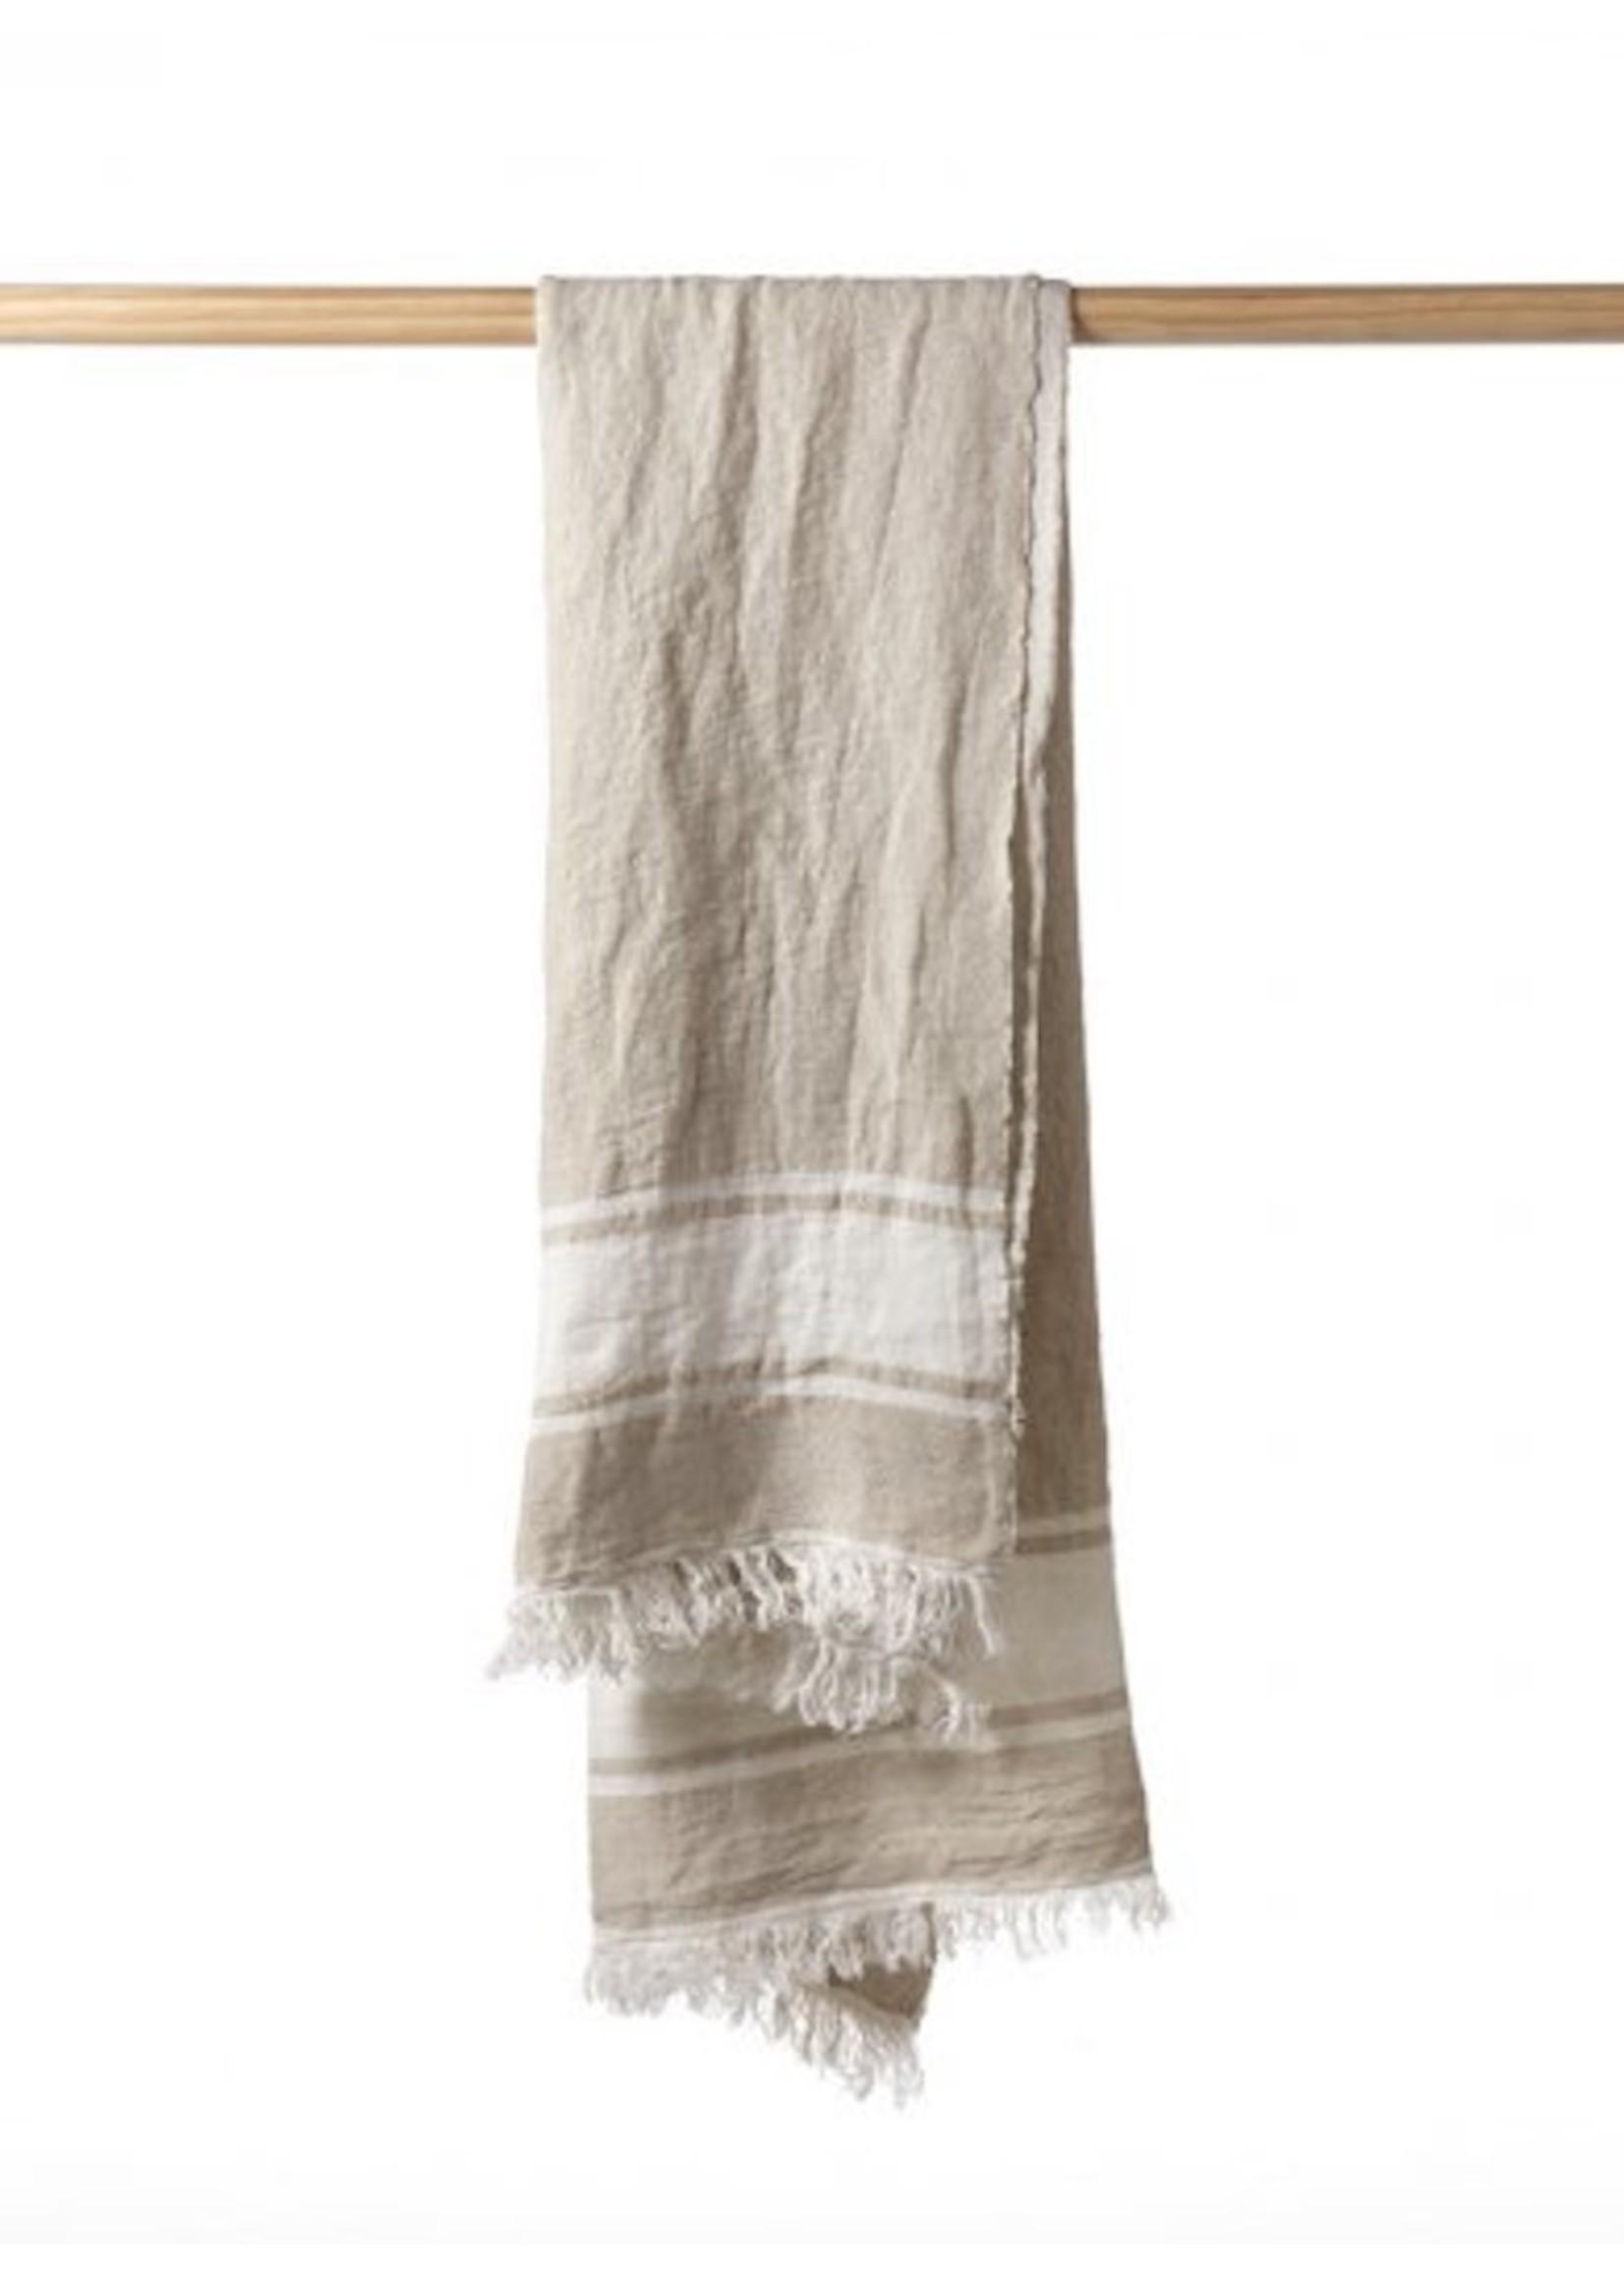 Libeco Libeco Flax Stripe Linen Towels